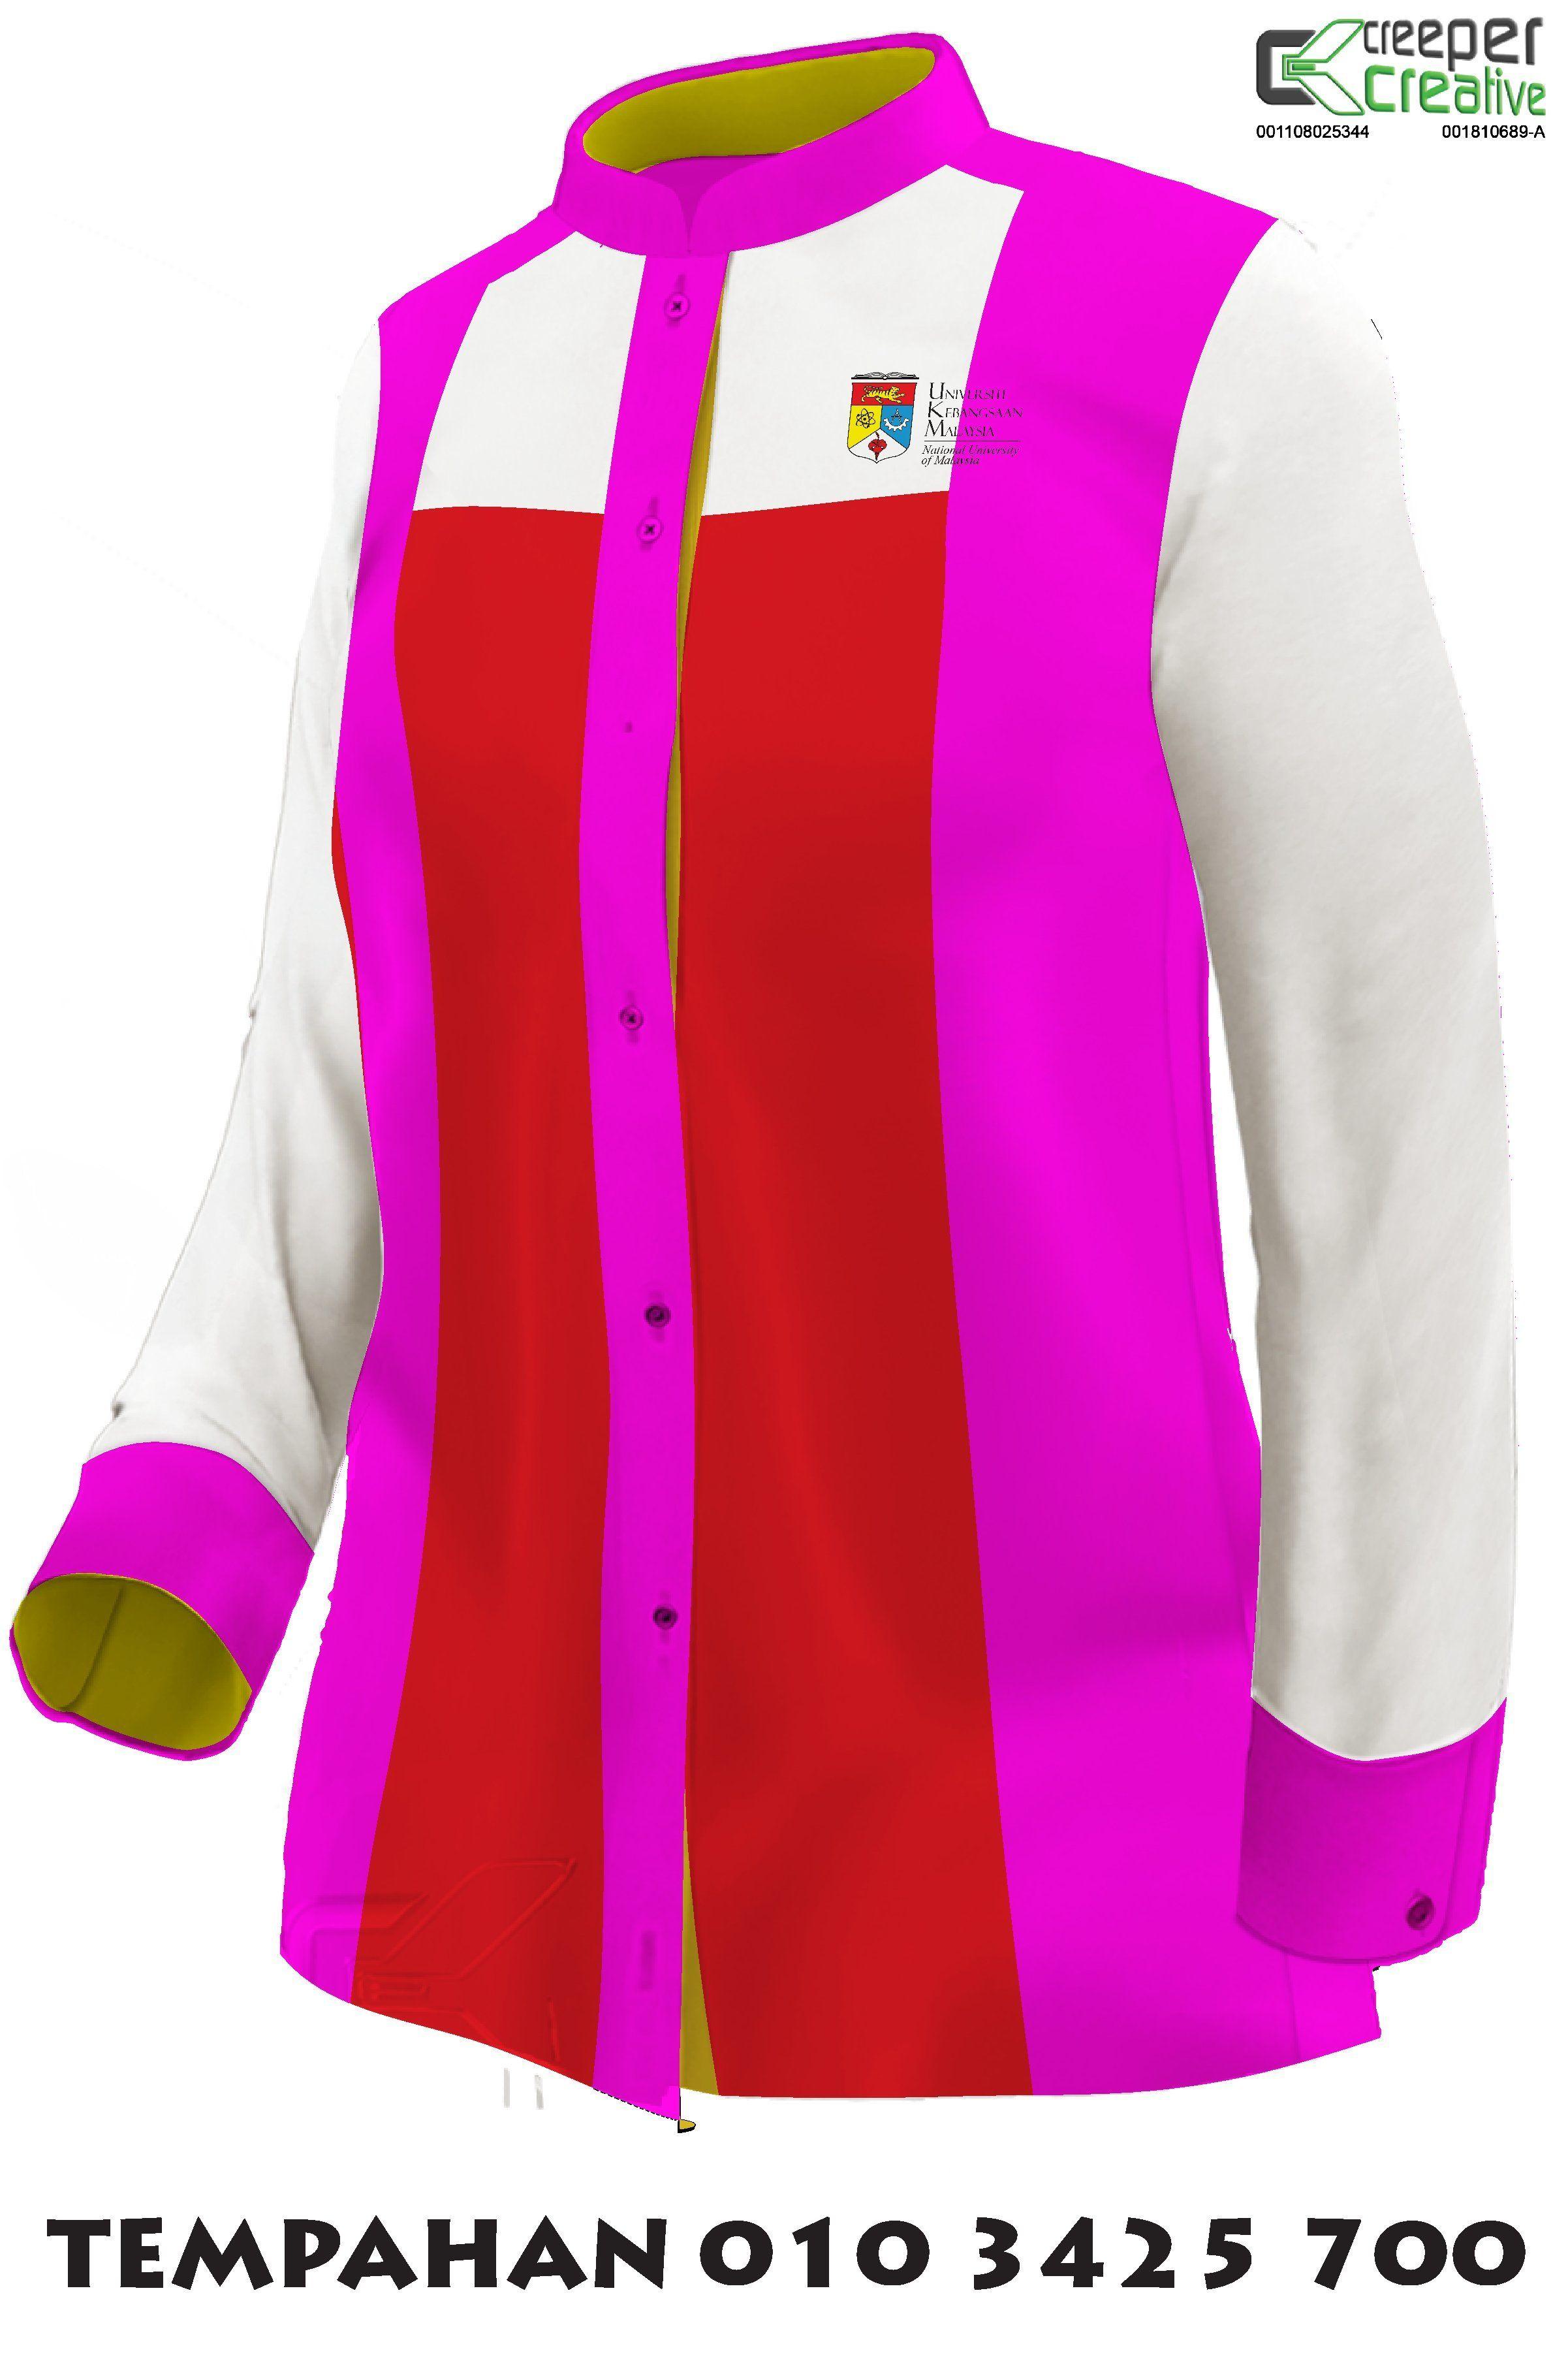 f7ac9088b Baju korporat design baju korporat muslimah pelbagai design khususnya baju  korporat wanita, jaminan kualiti serta